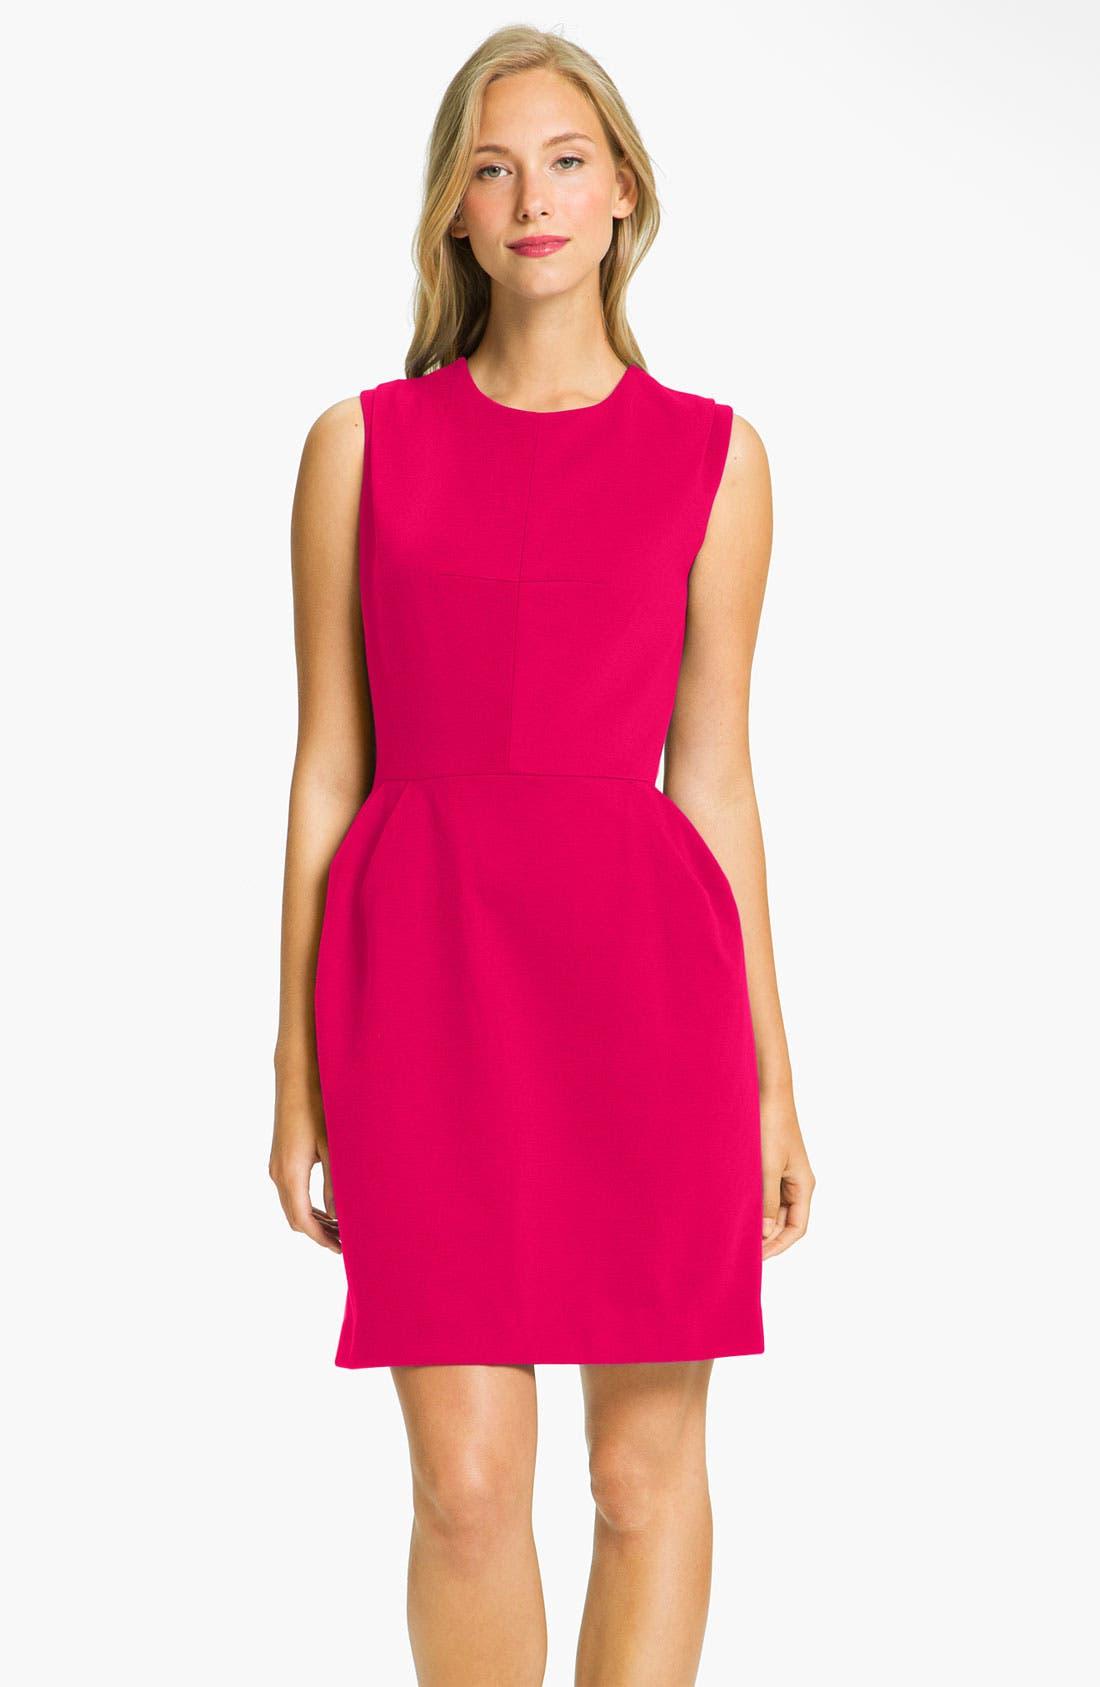 Alternate Image 1 Selected - Donna Morgan Sleeveless Ponte Knit Tulip Dress (Petite)